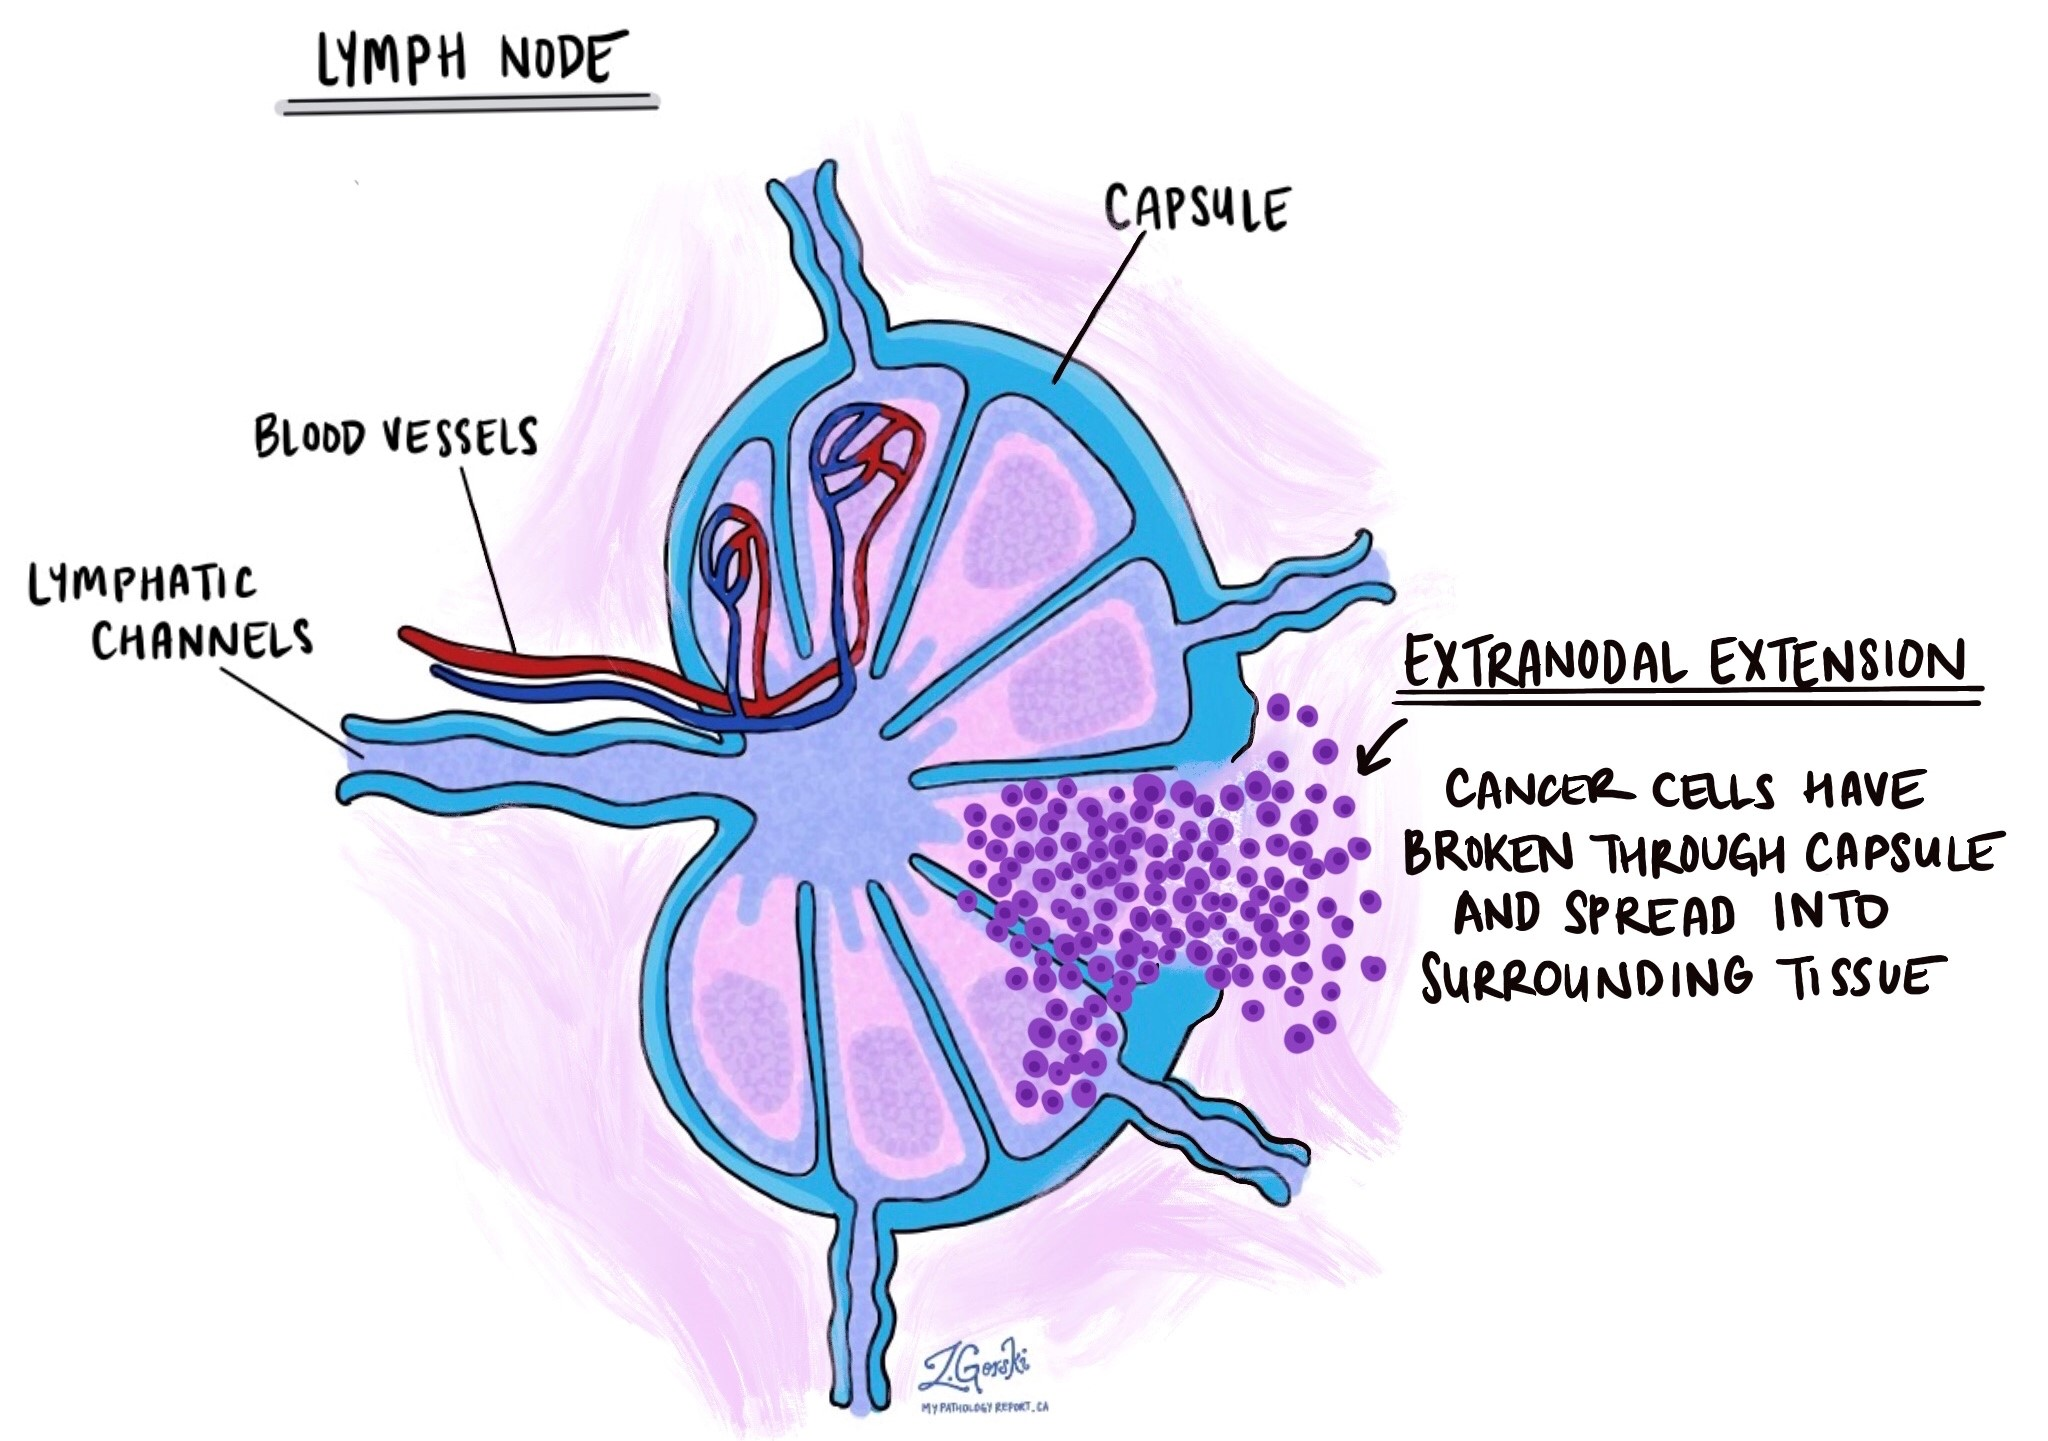 extranodal extension